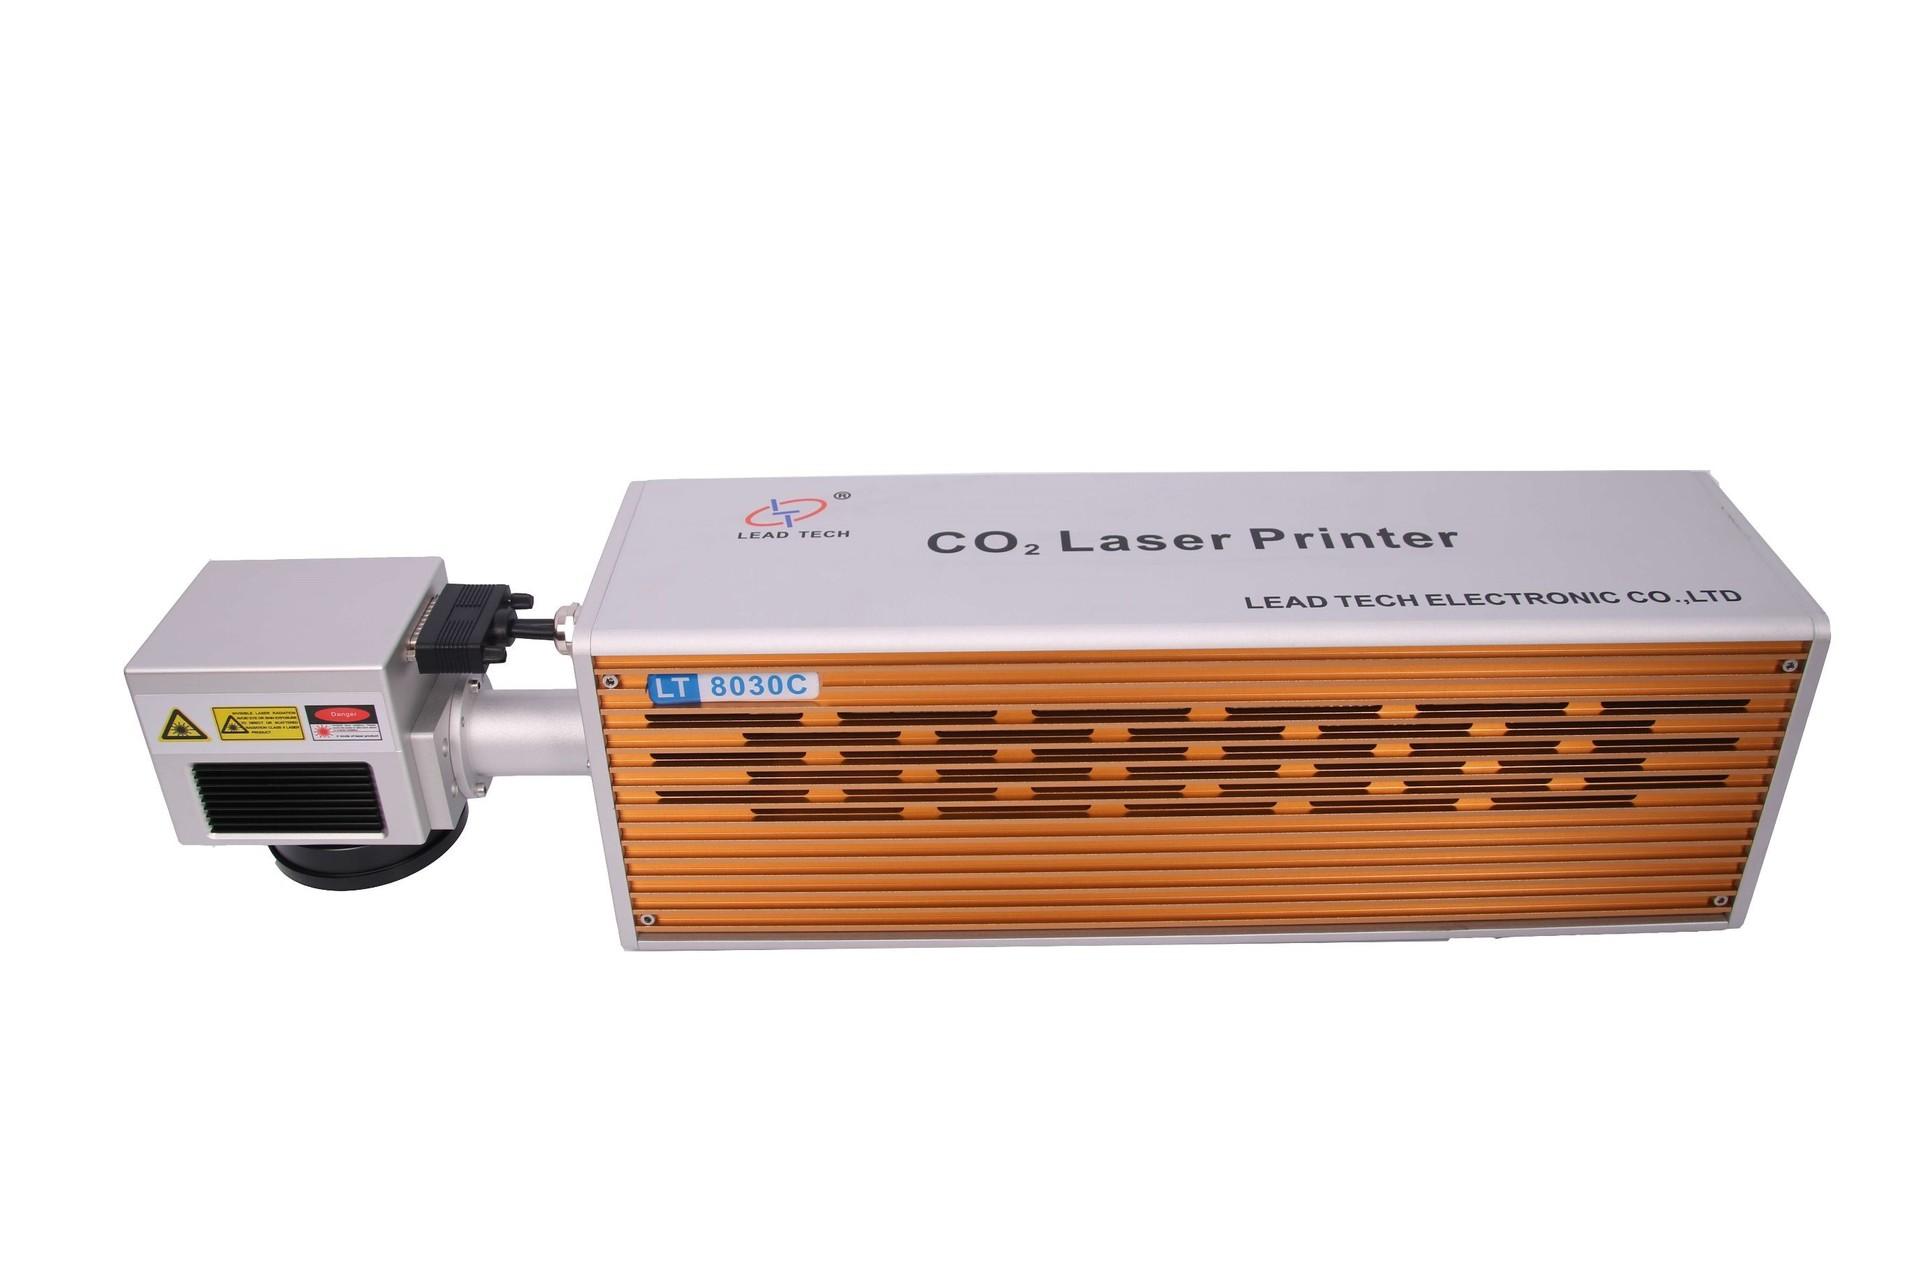 Lt8020c/Lt8030c CO2 20W/30W High Performance Digital Milk Box Laser Marking Printer